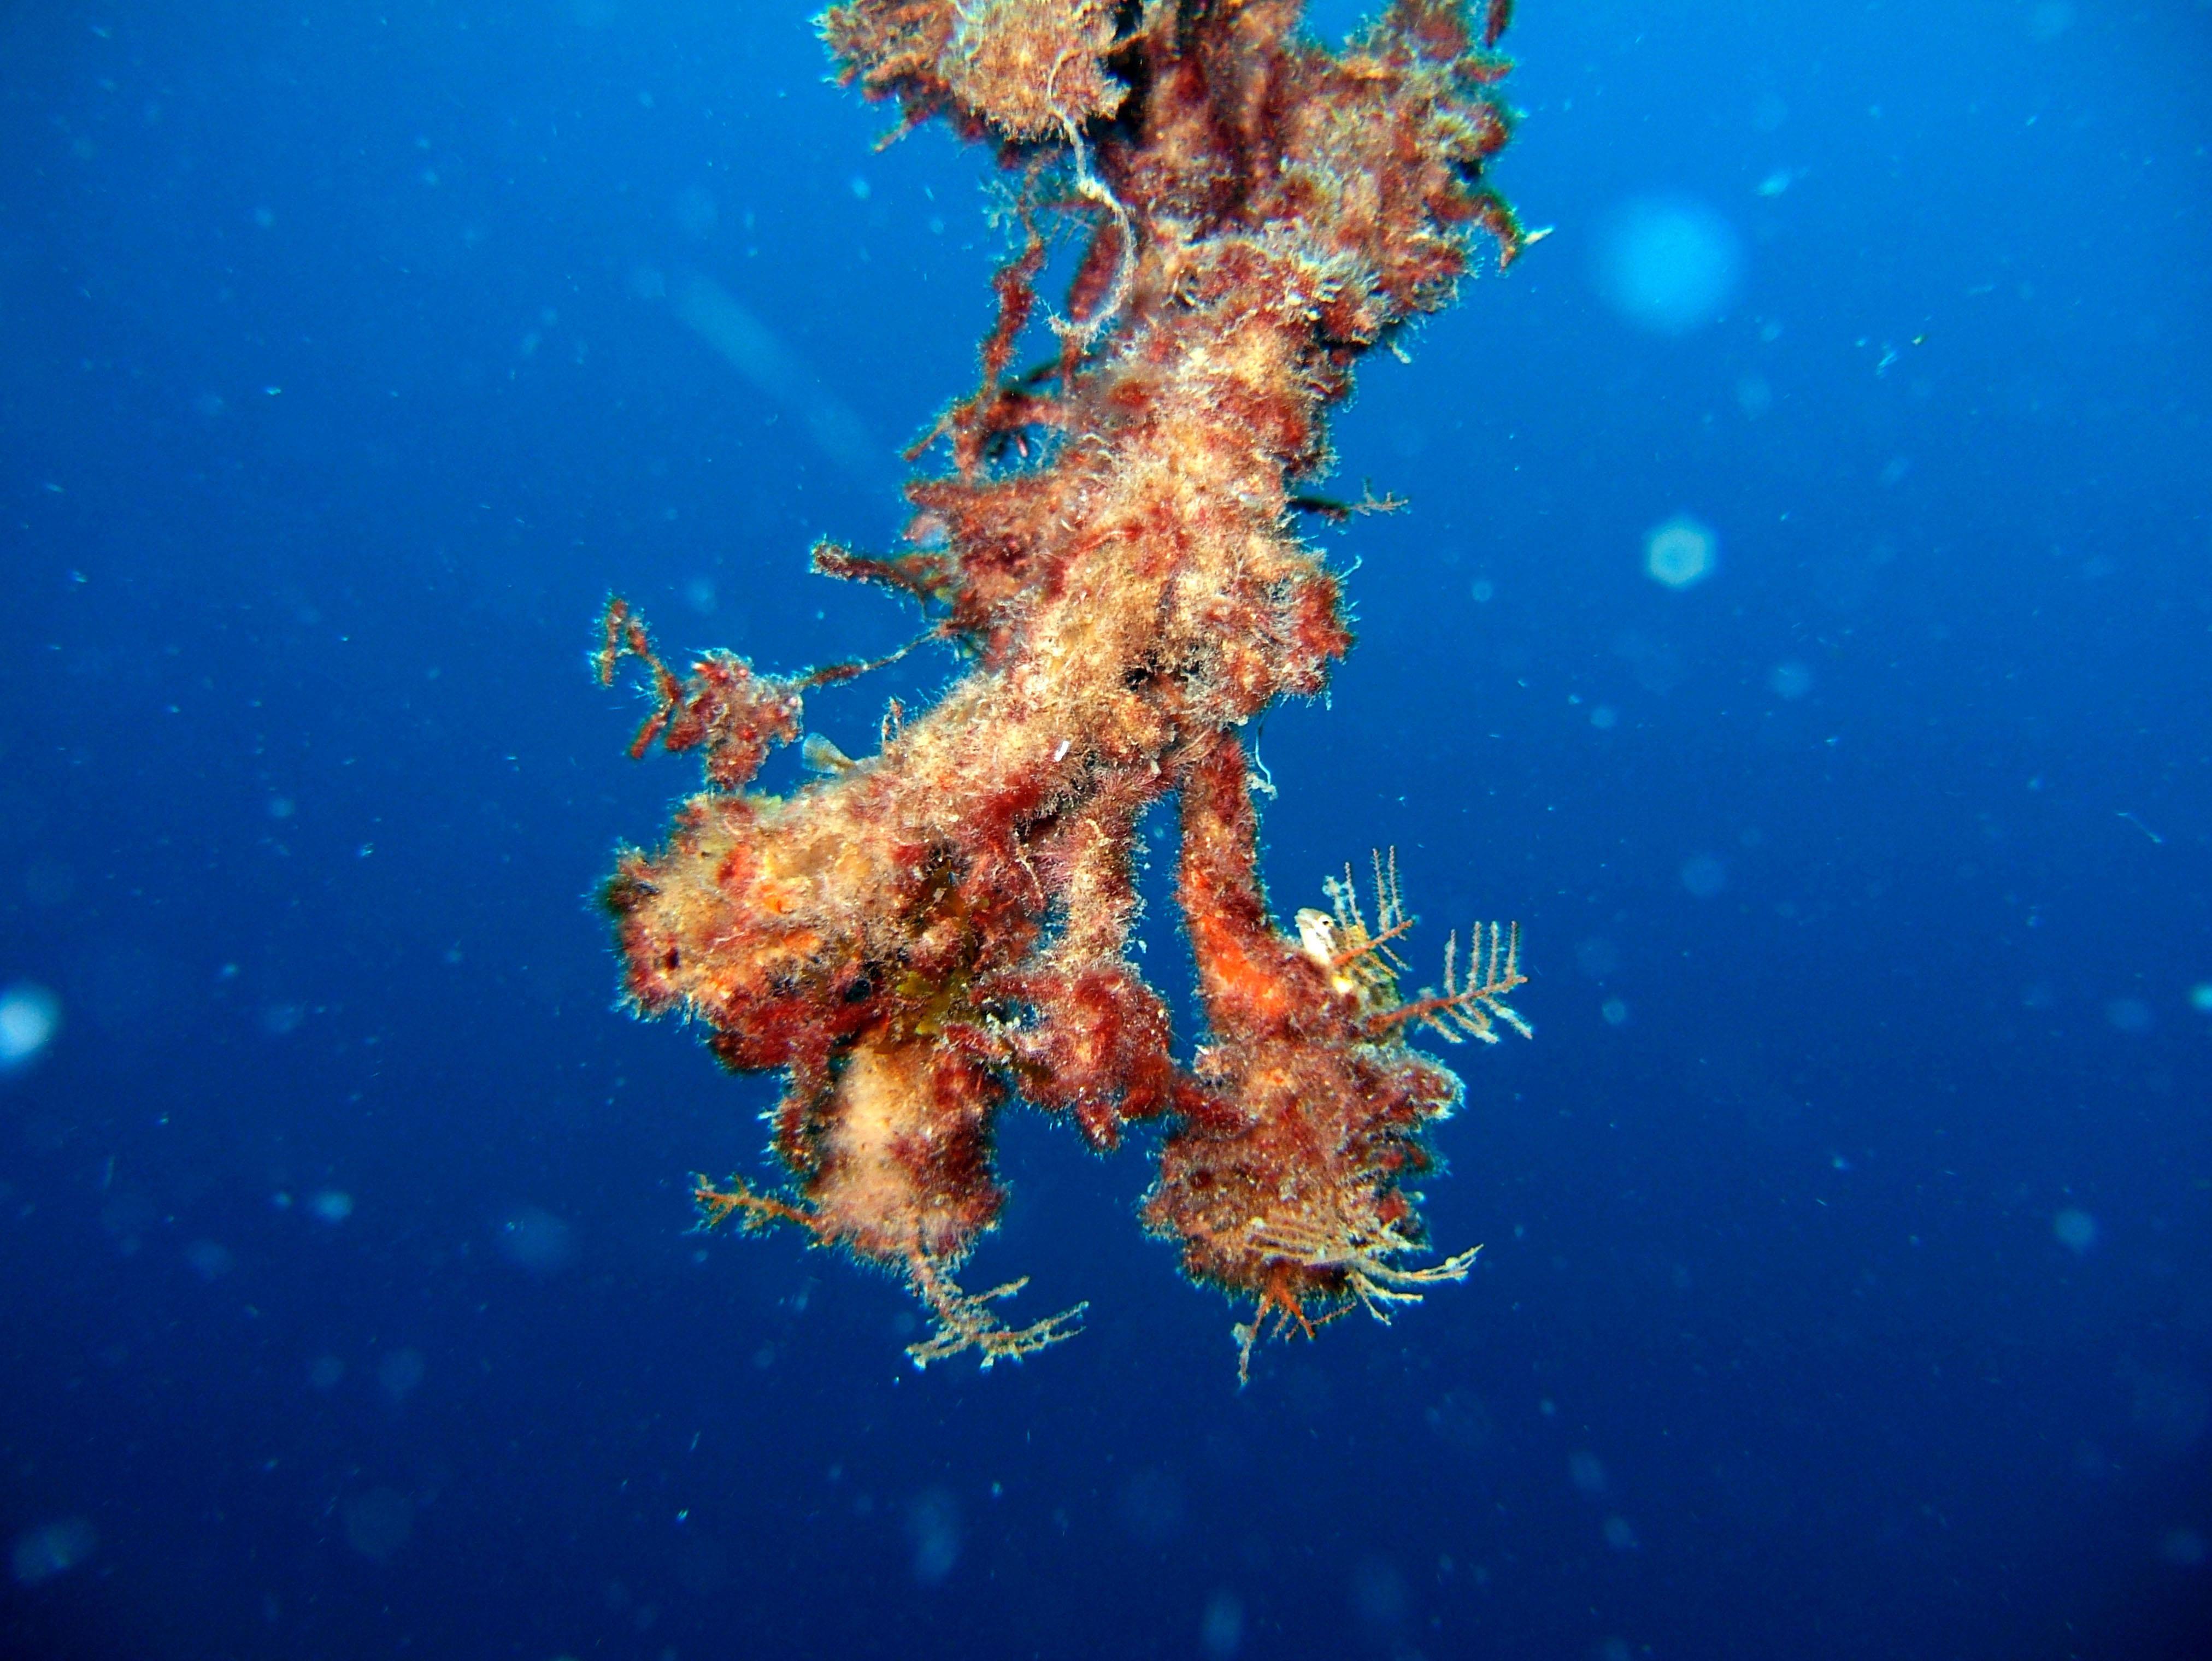 Coron dive site 8 Wreck dive IJN Olympia Maru July 2005 24